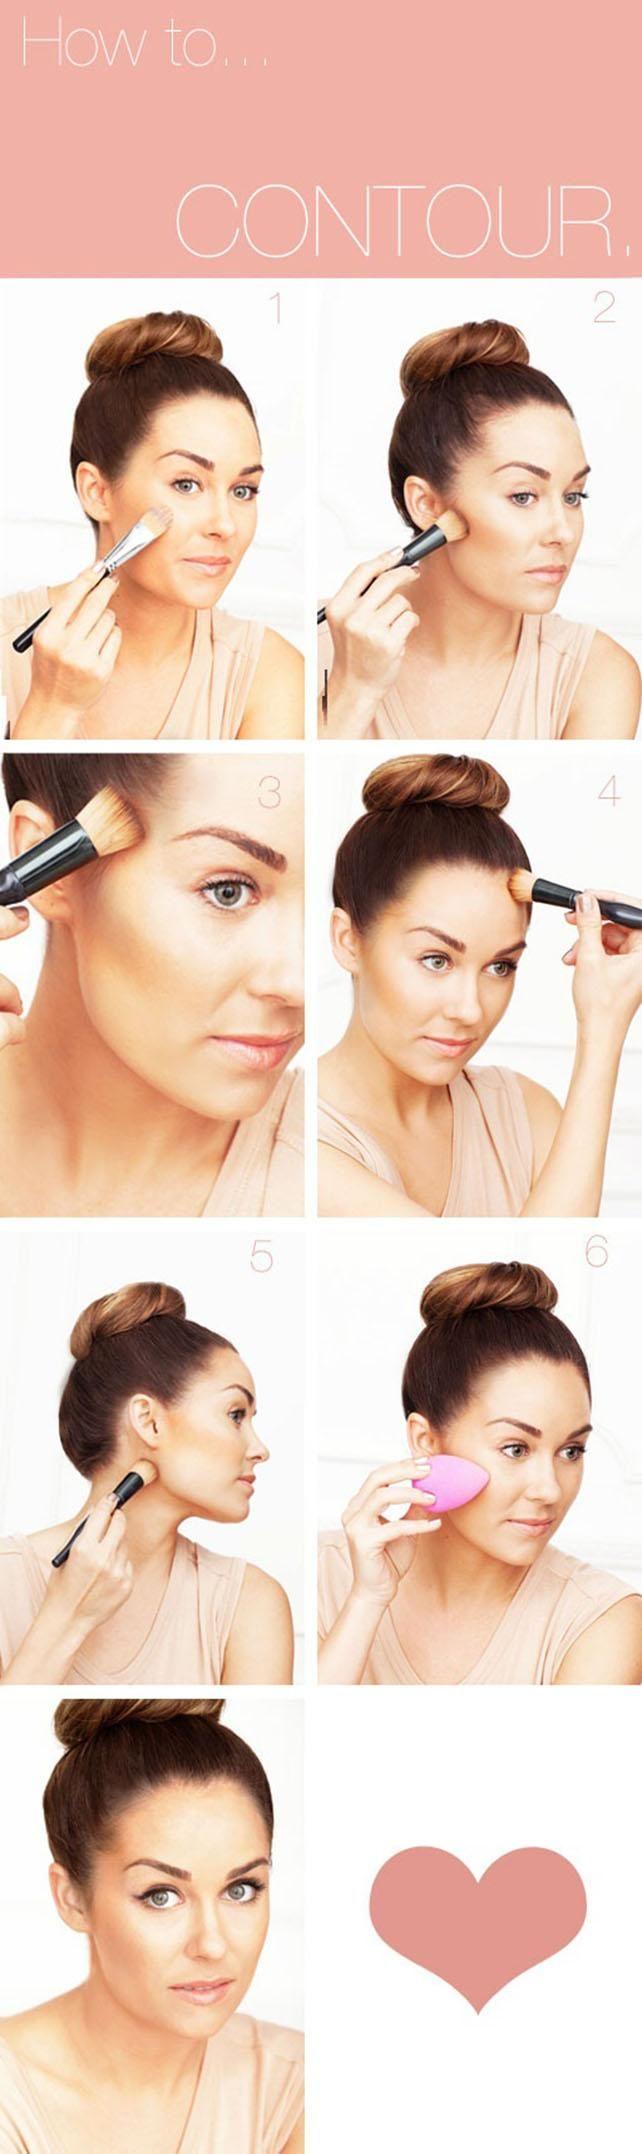 diy countour guide #makeup #diy #countour http://www.fereckels.com/curator/heather/makeup-11575/63164.html